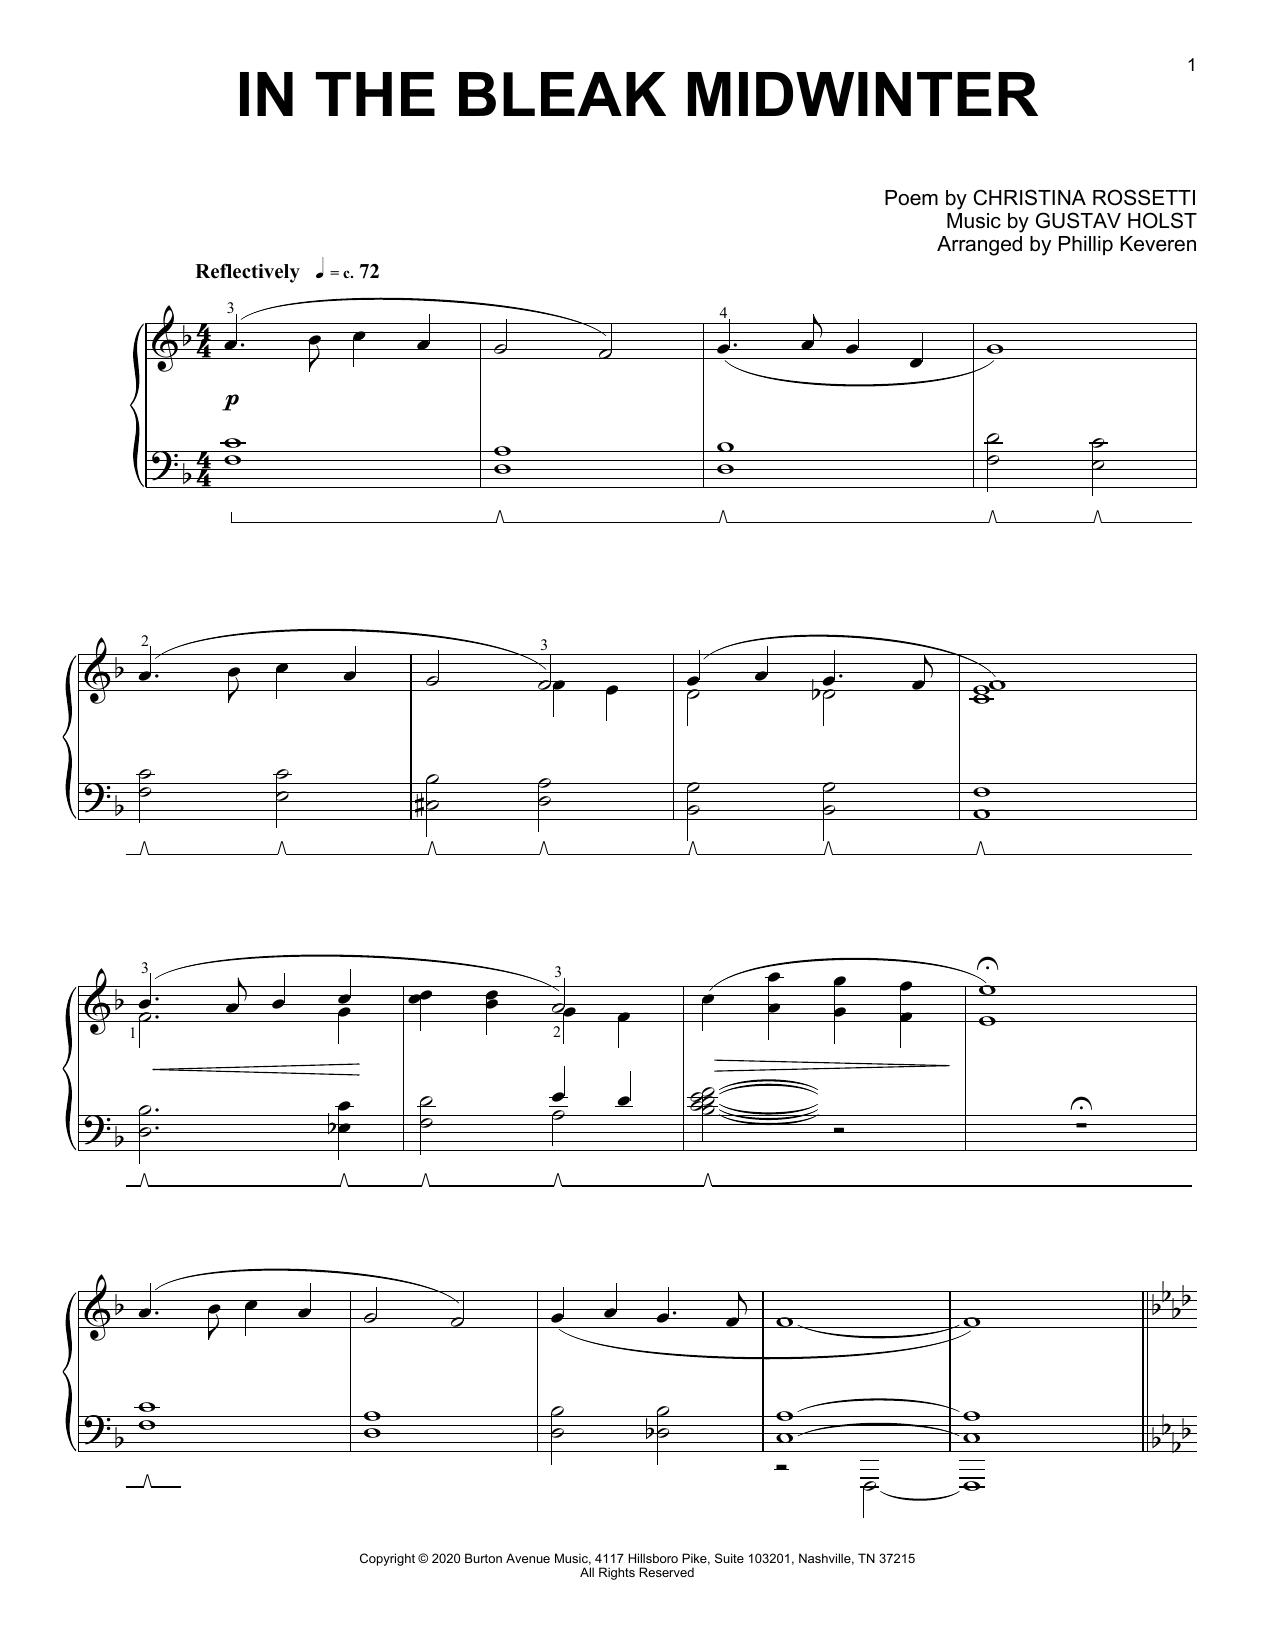 Gustav Holst In The Bleak Midwinter (arr. Phillip Keveren) sheet music notes and chords. Download Printable PDF.